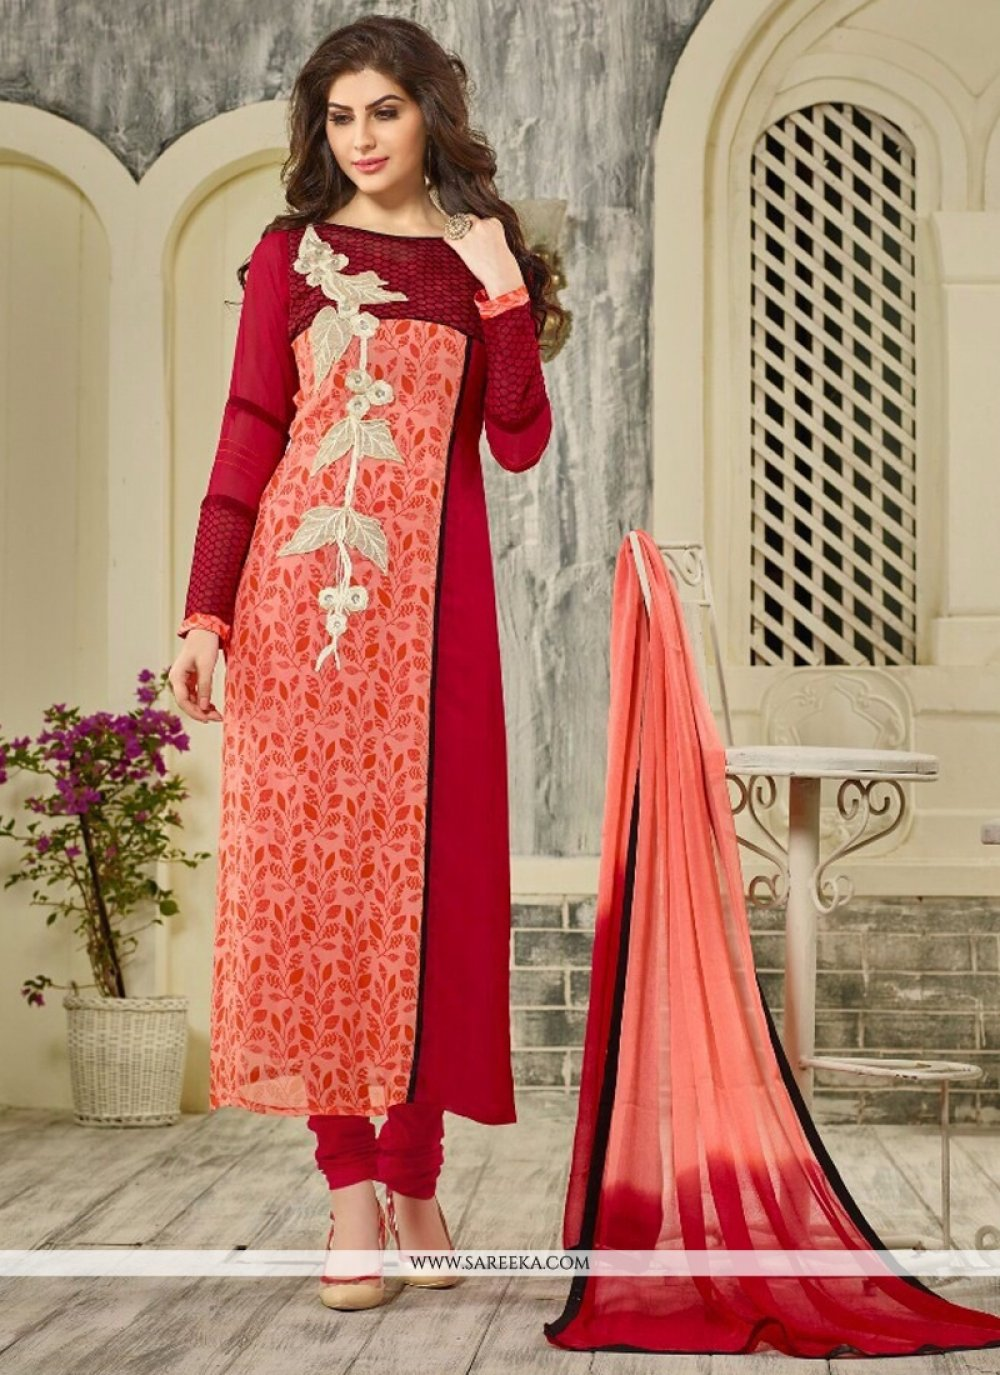 Georgette Red Embroidered Work Designer Straight Salwar Kameez